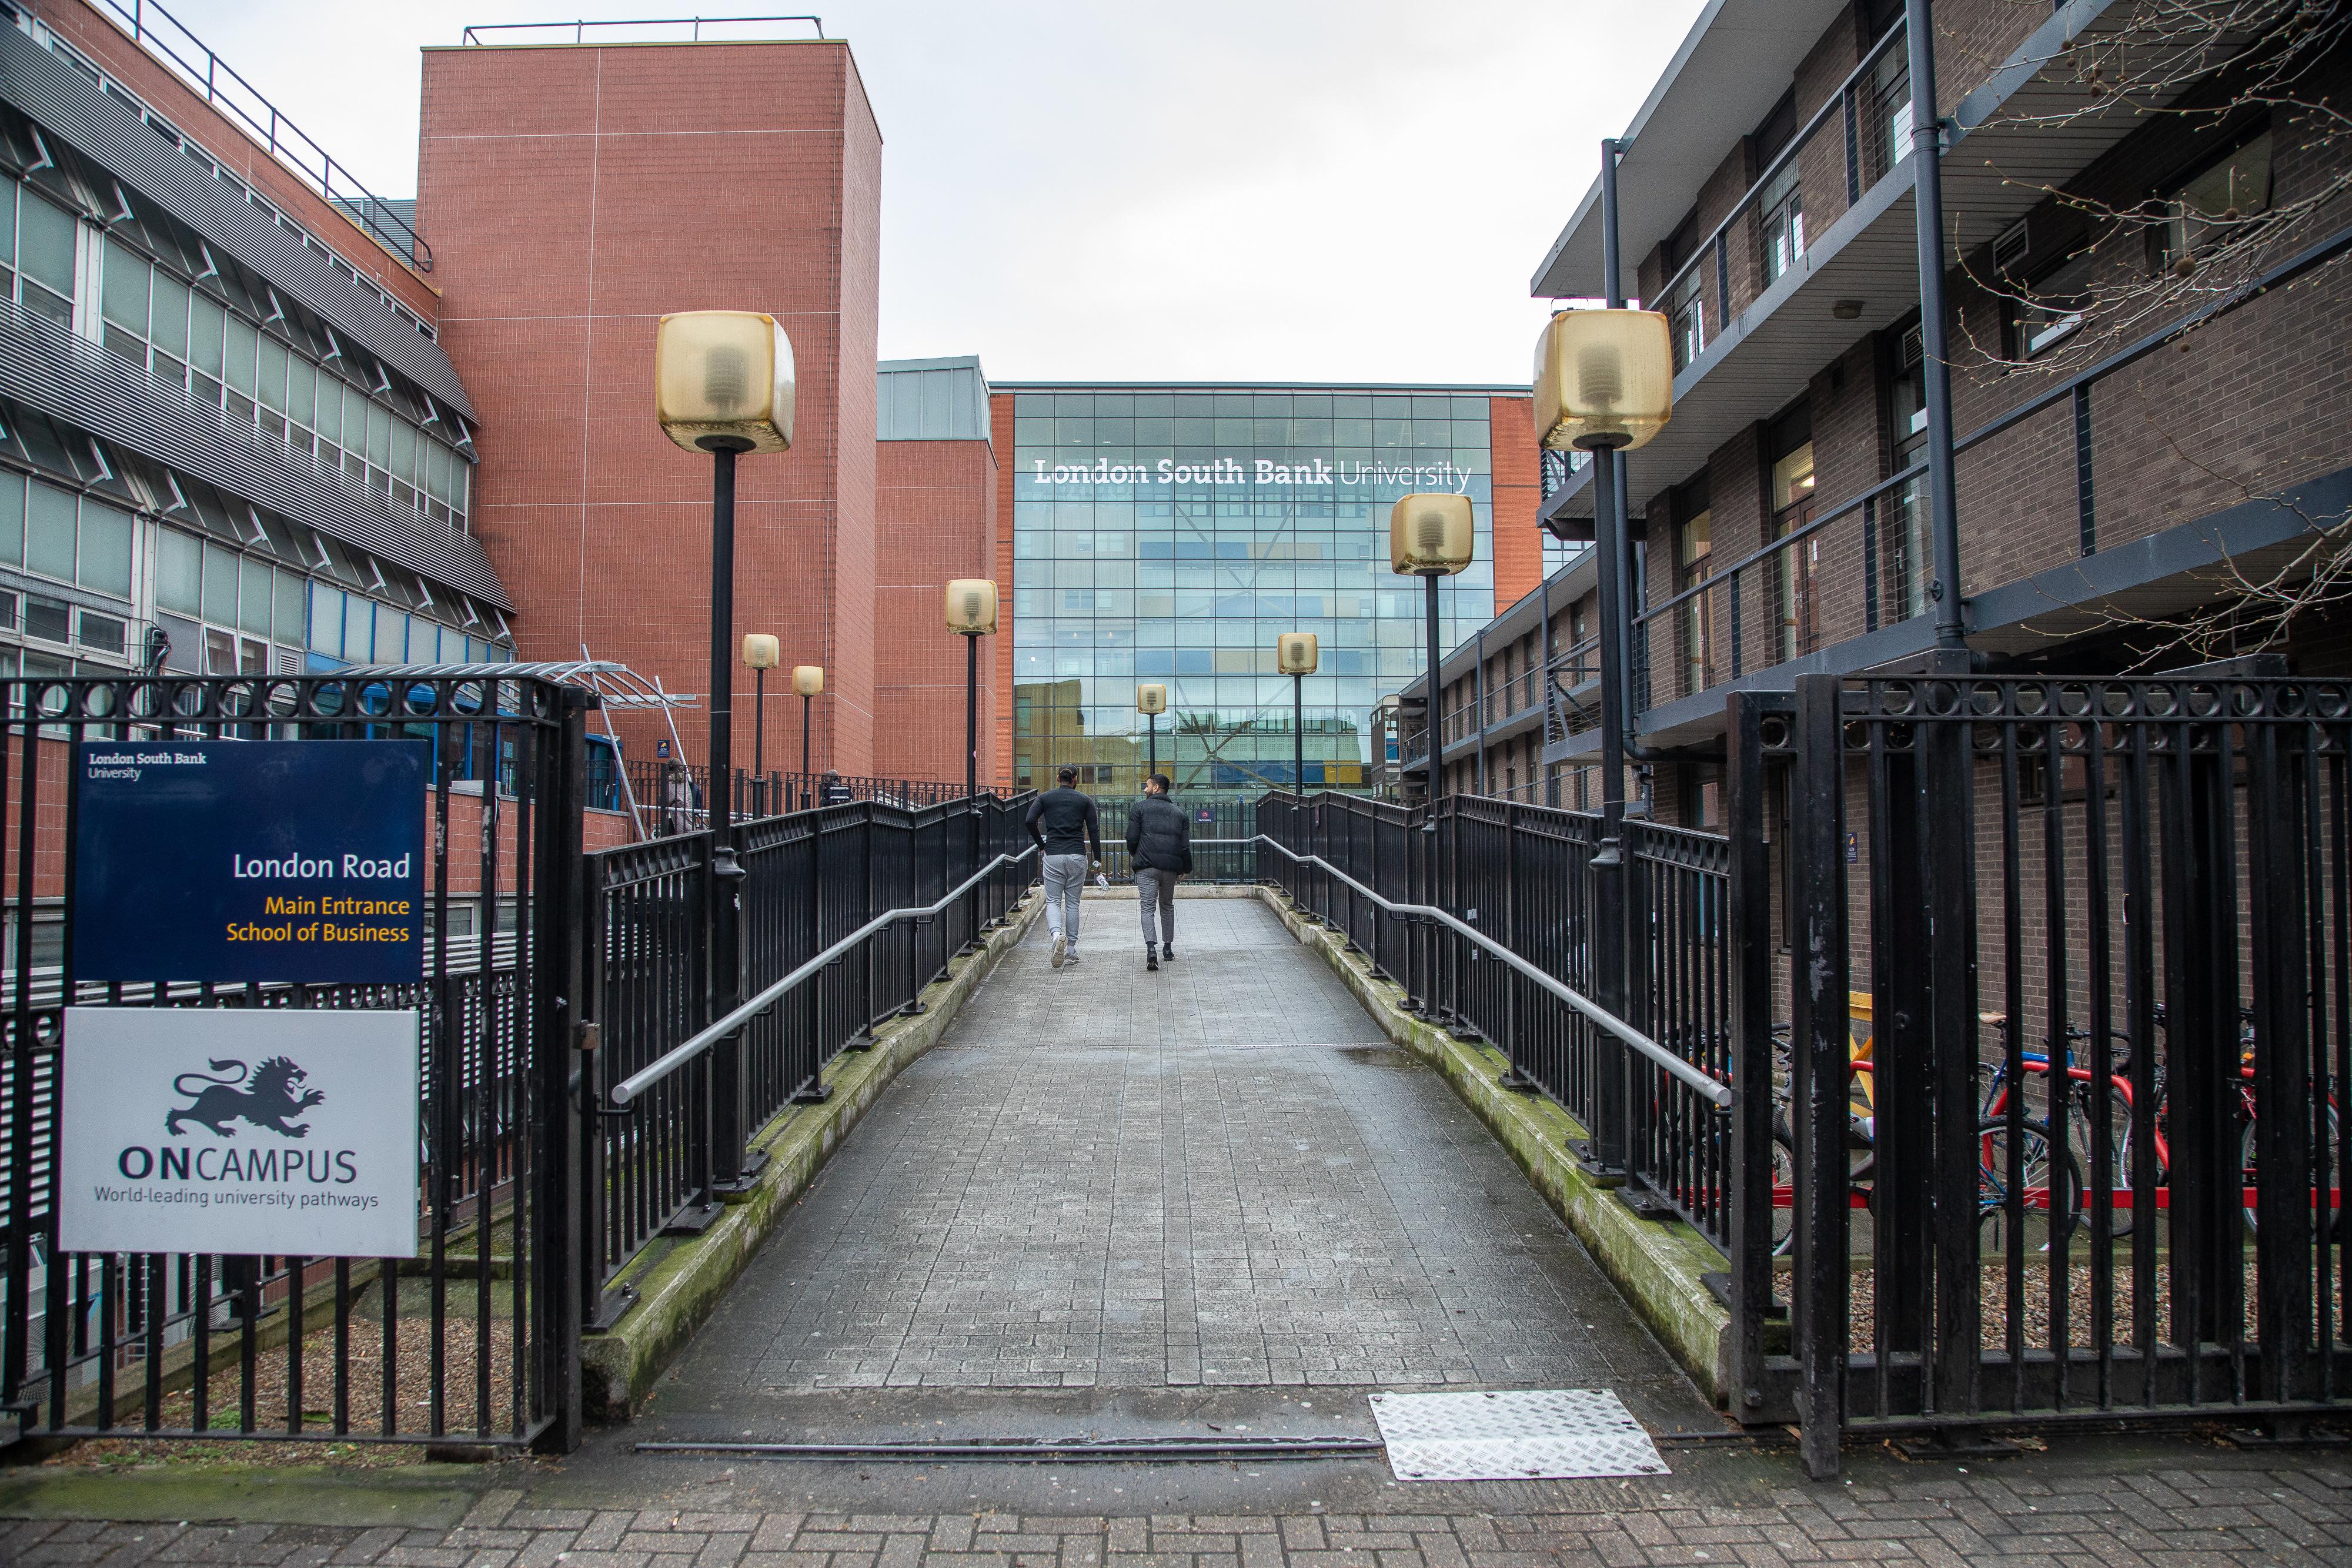 File:London South Bank University outside.jpg - Wikimedia Commons